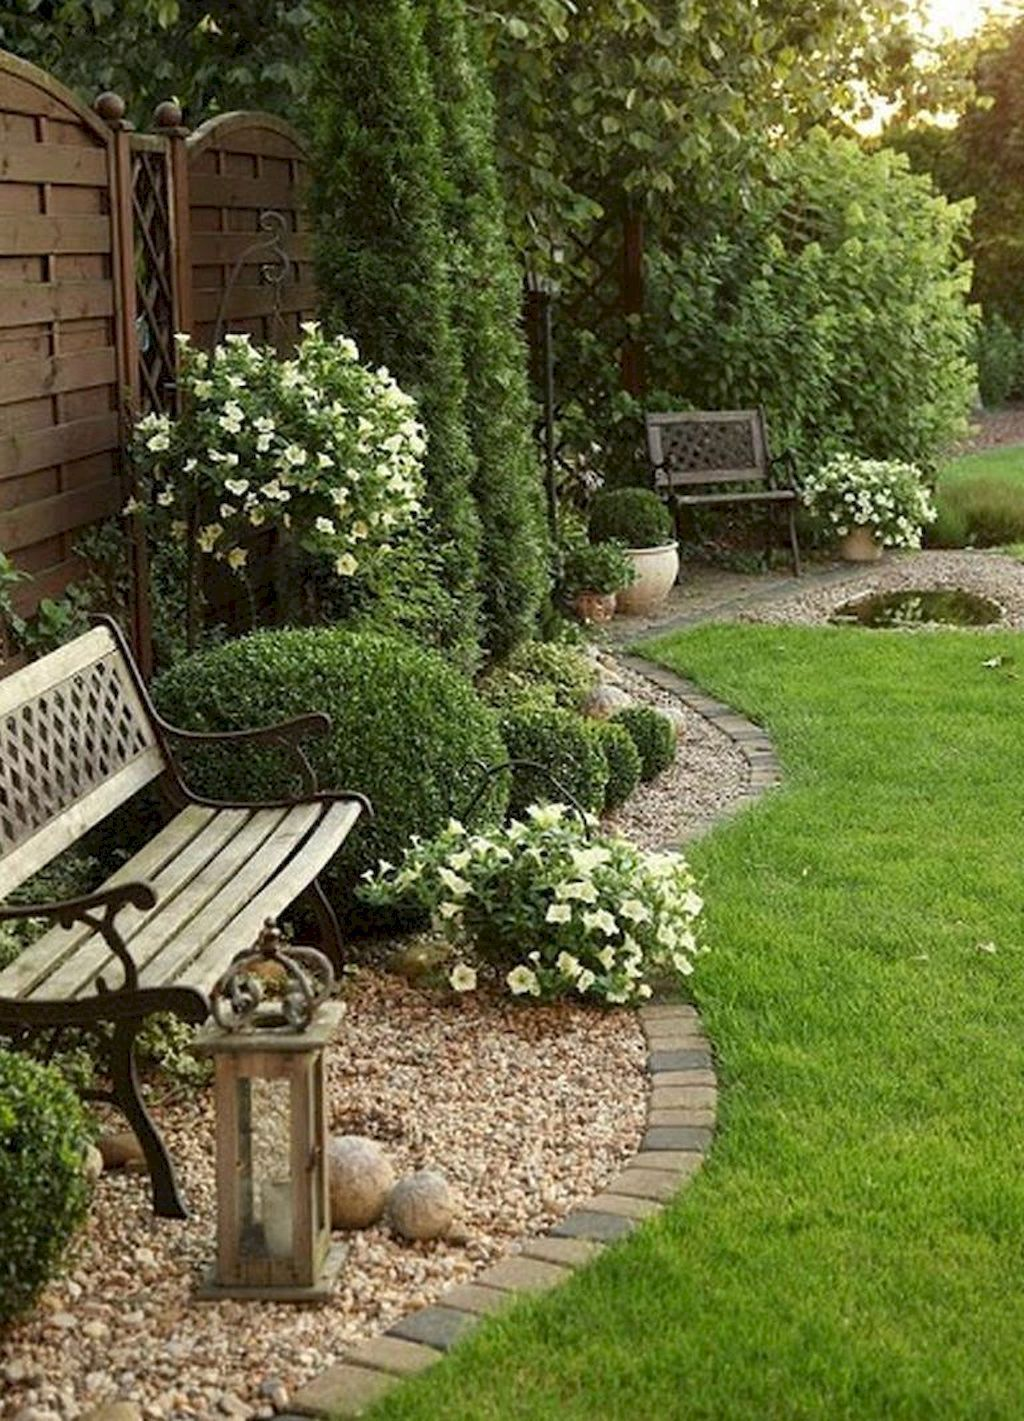 garden landscape gorgeous front yard garden landscaping ideas (21) ZKIHQRS